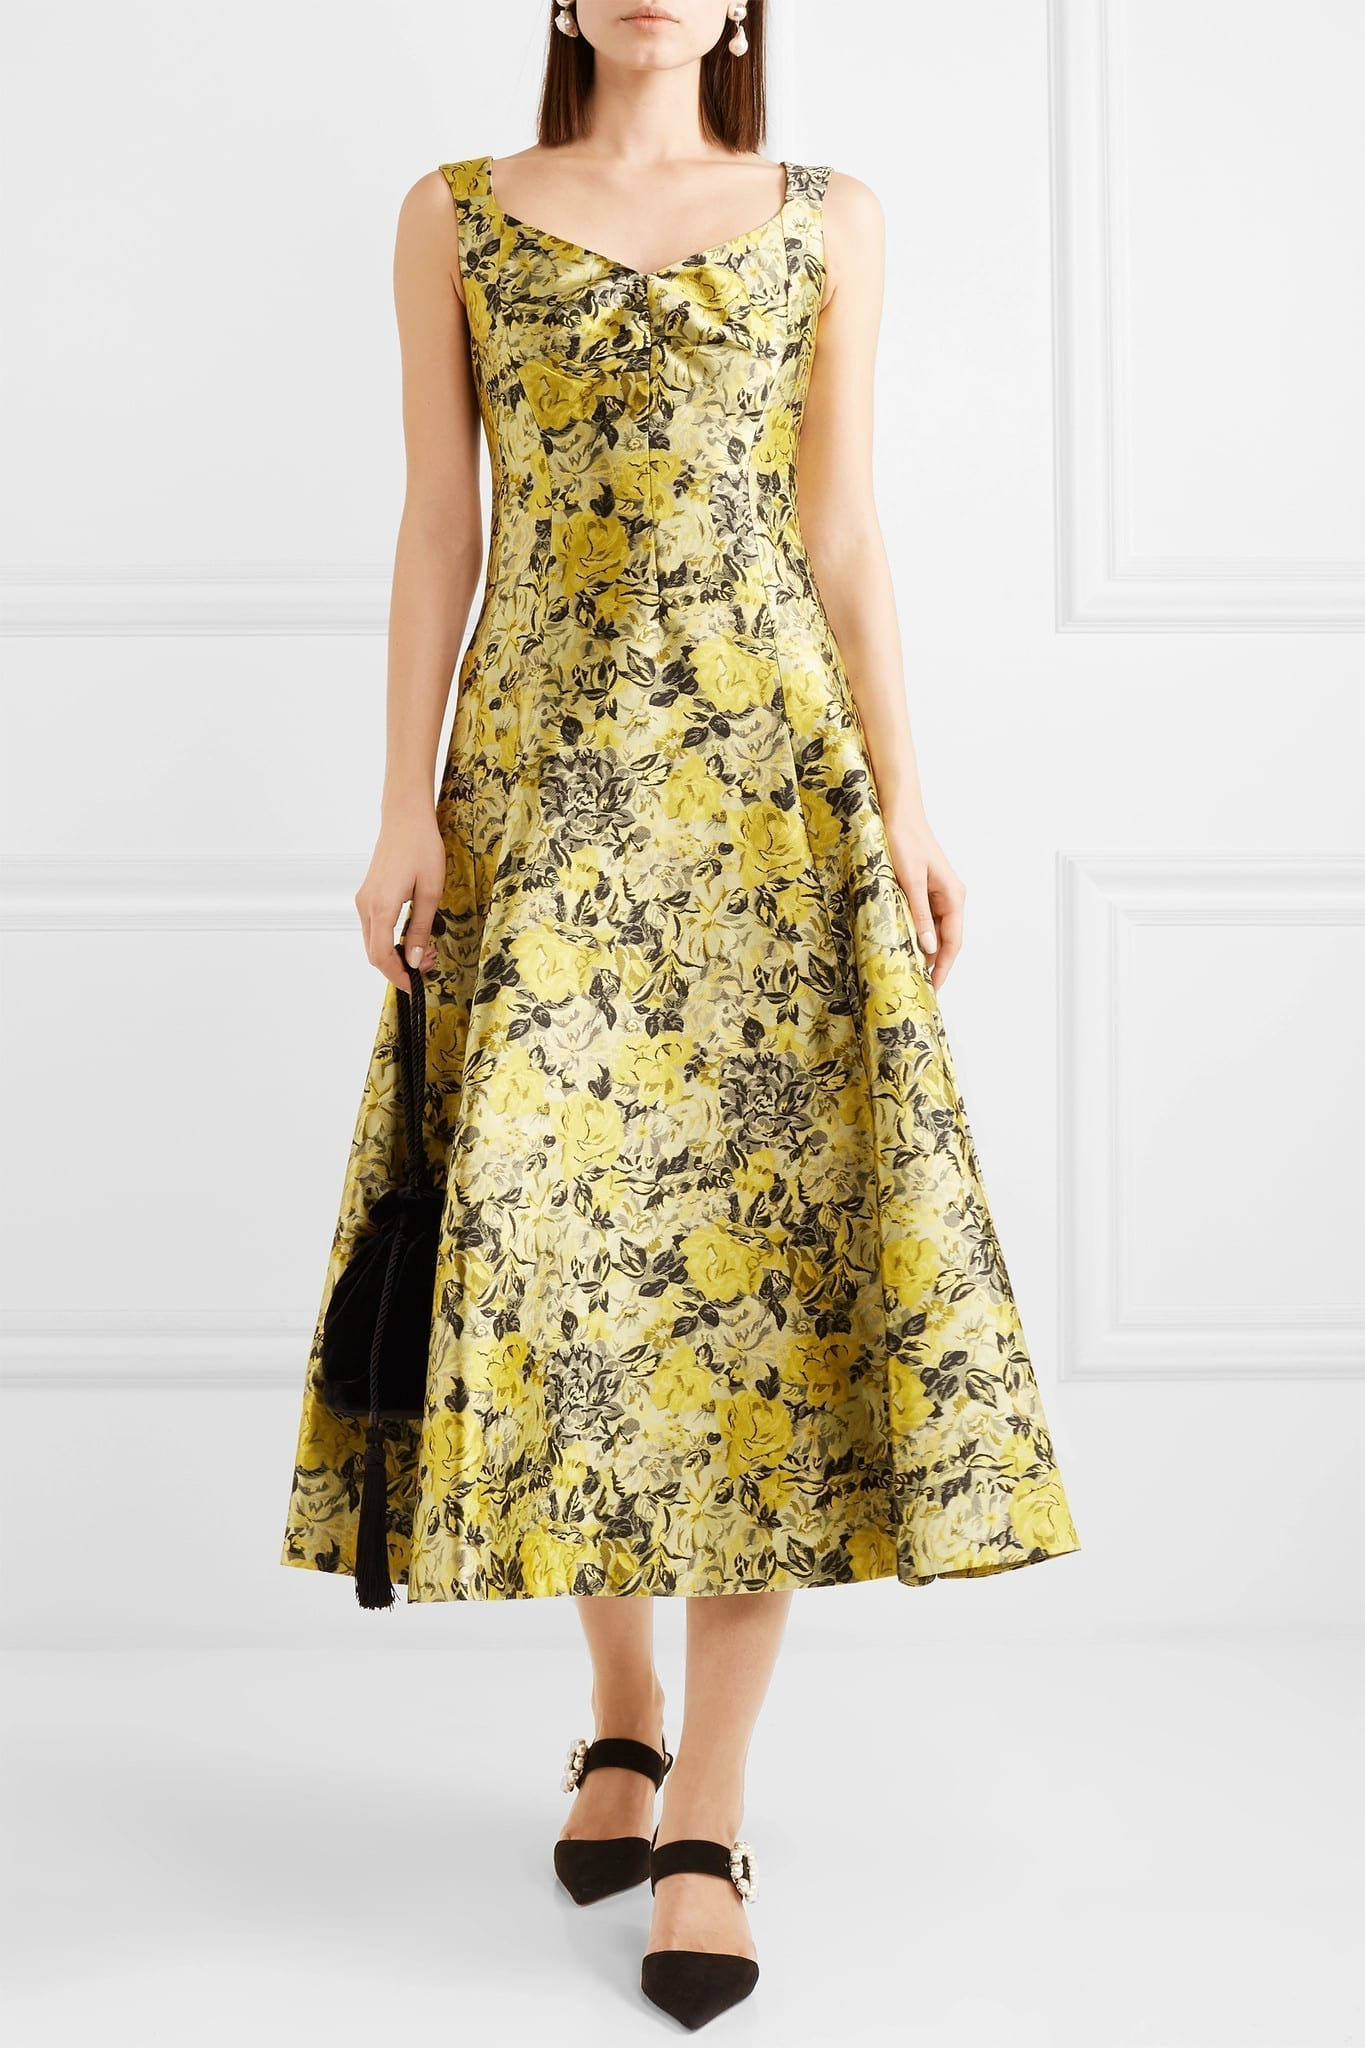 ERDEM Verna Floral-Jacquard Midi Yellow Dress